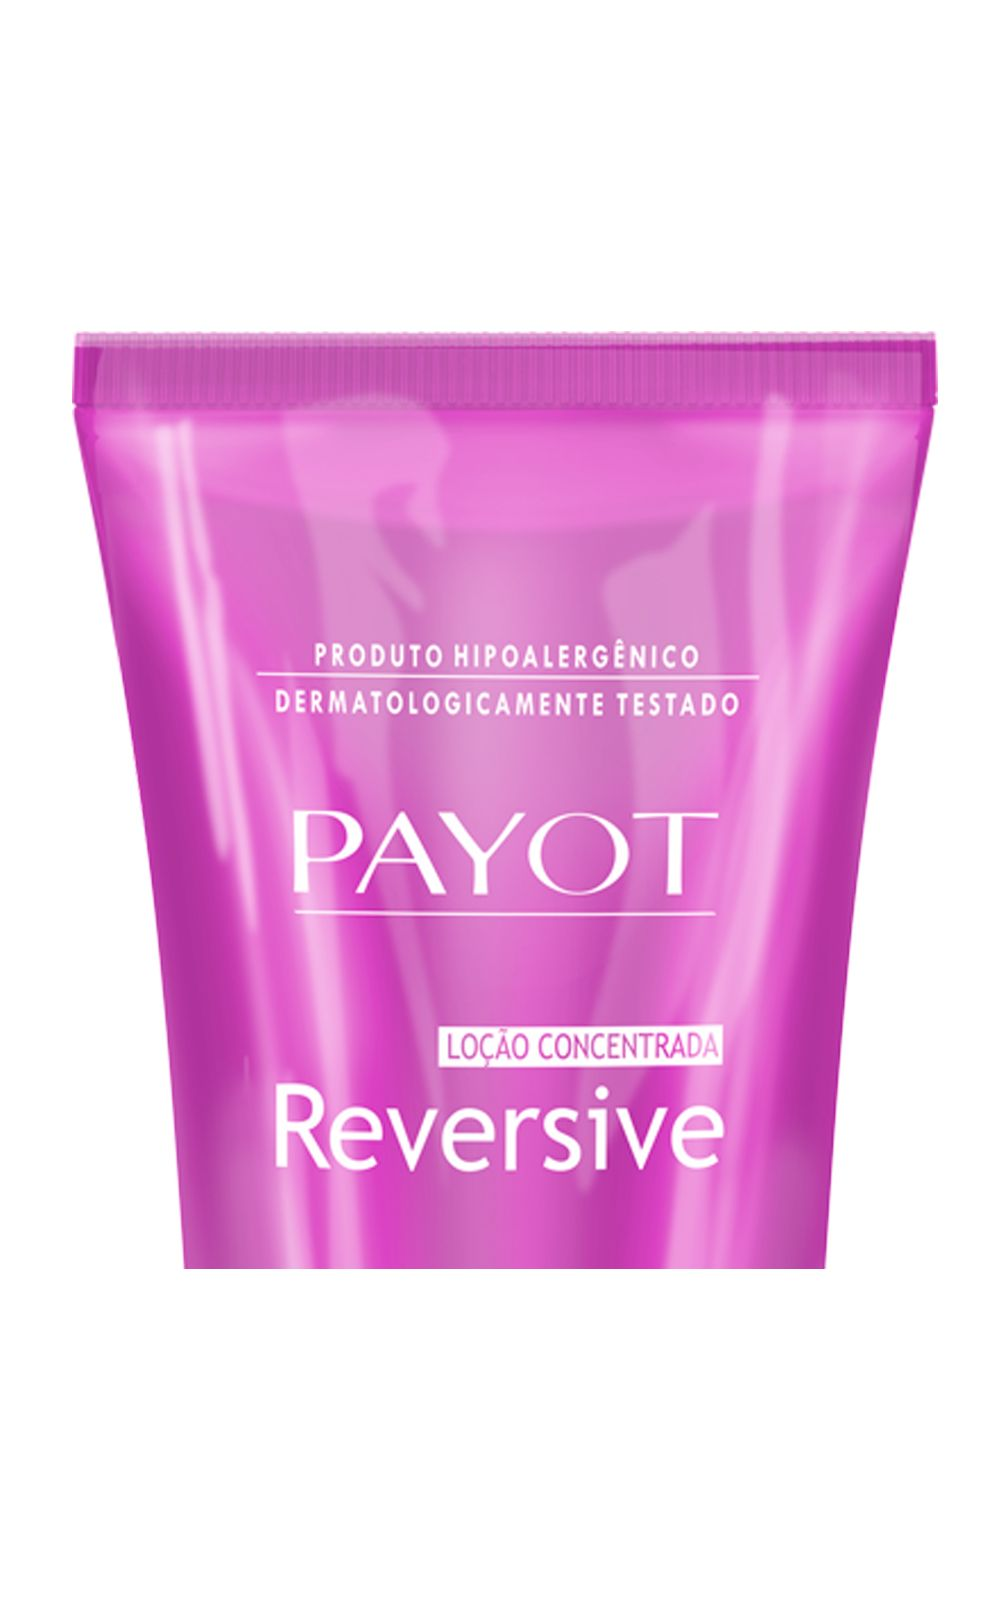 Foto 2 - Rejuvenescedor Facial Payot - Reversive - 30ml